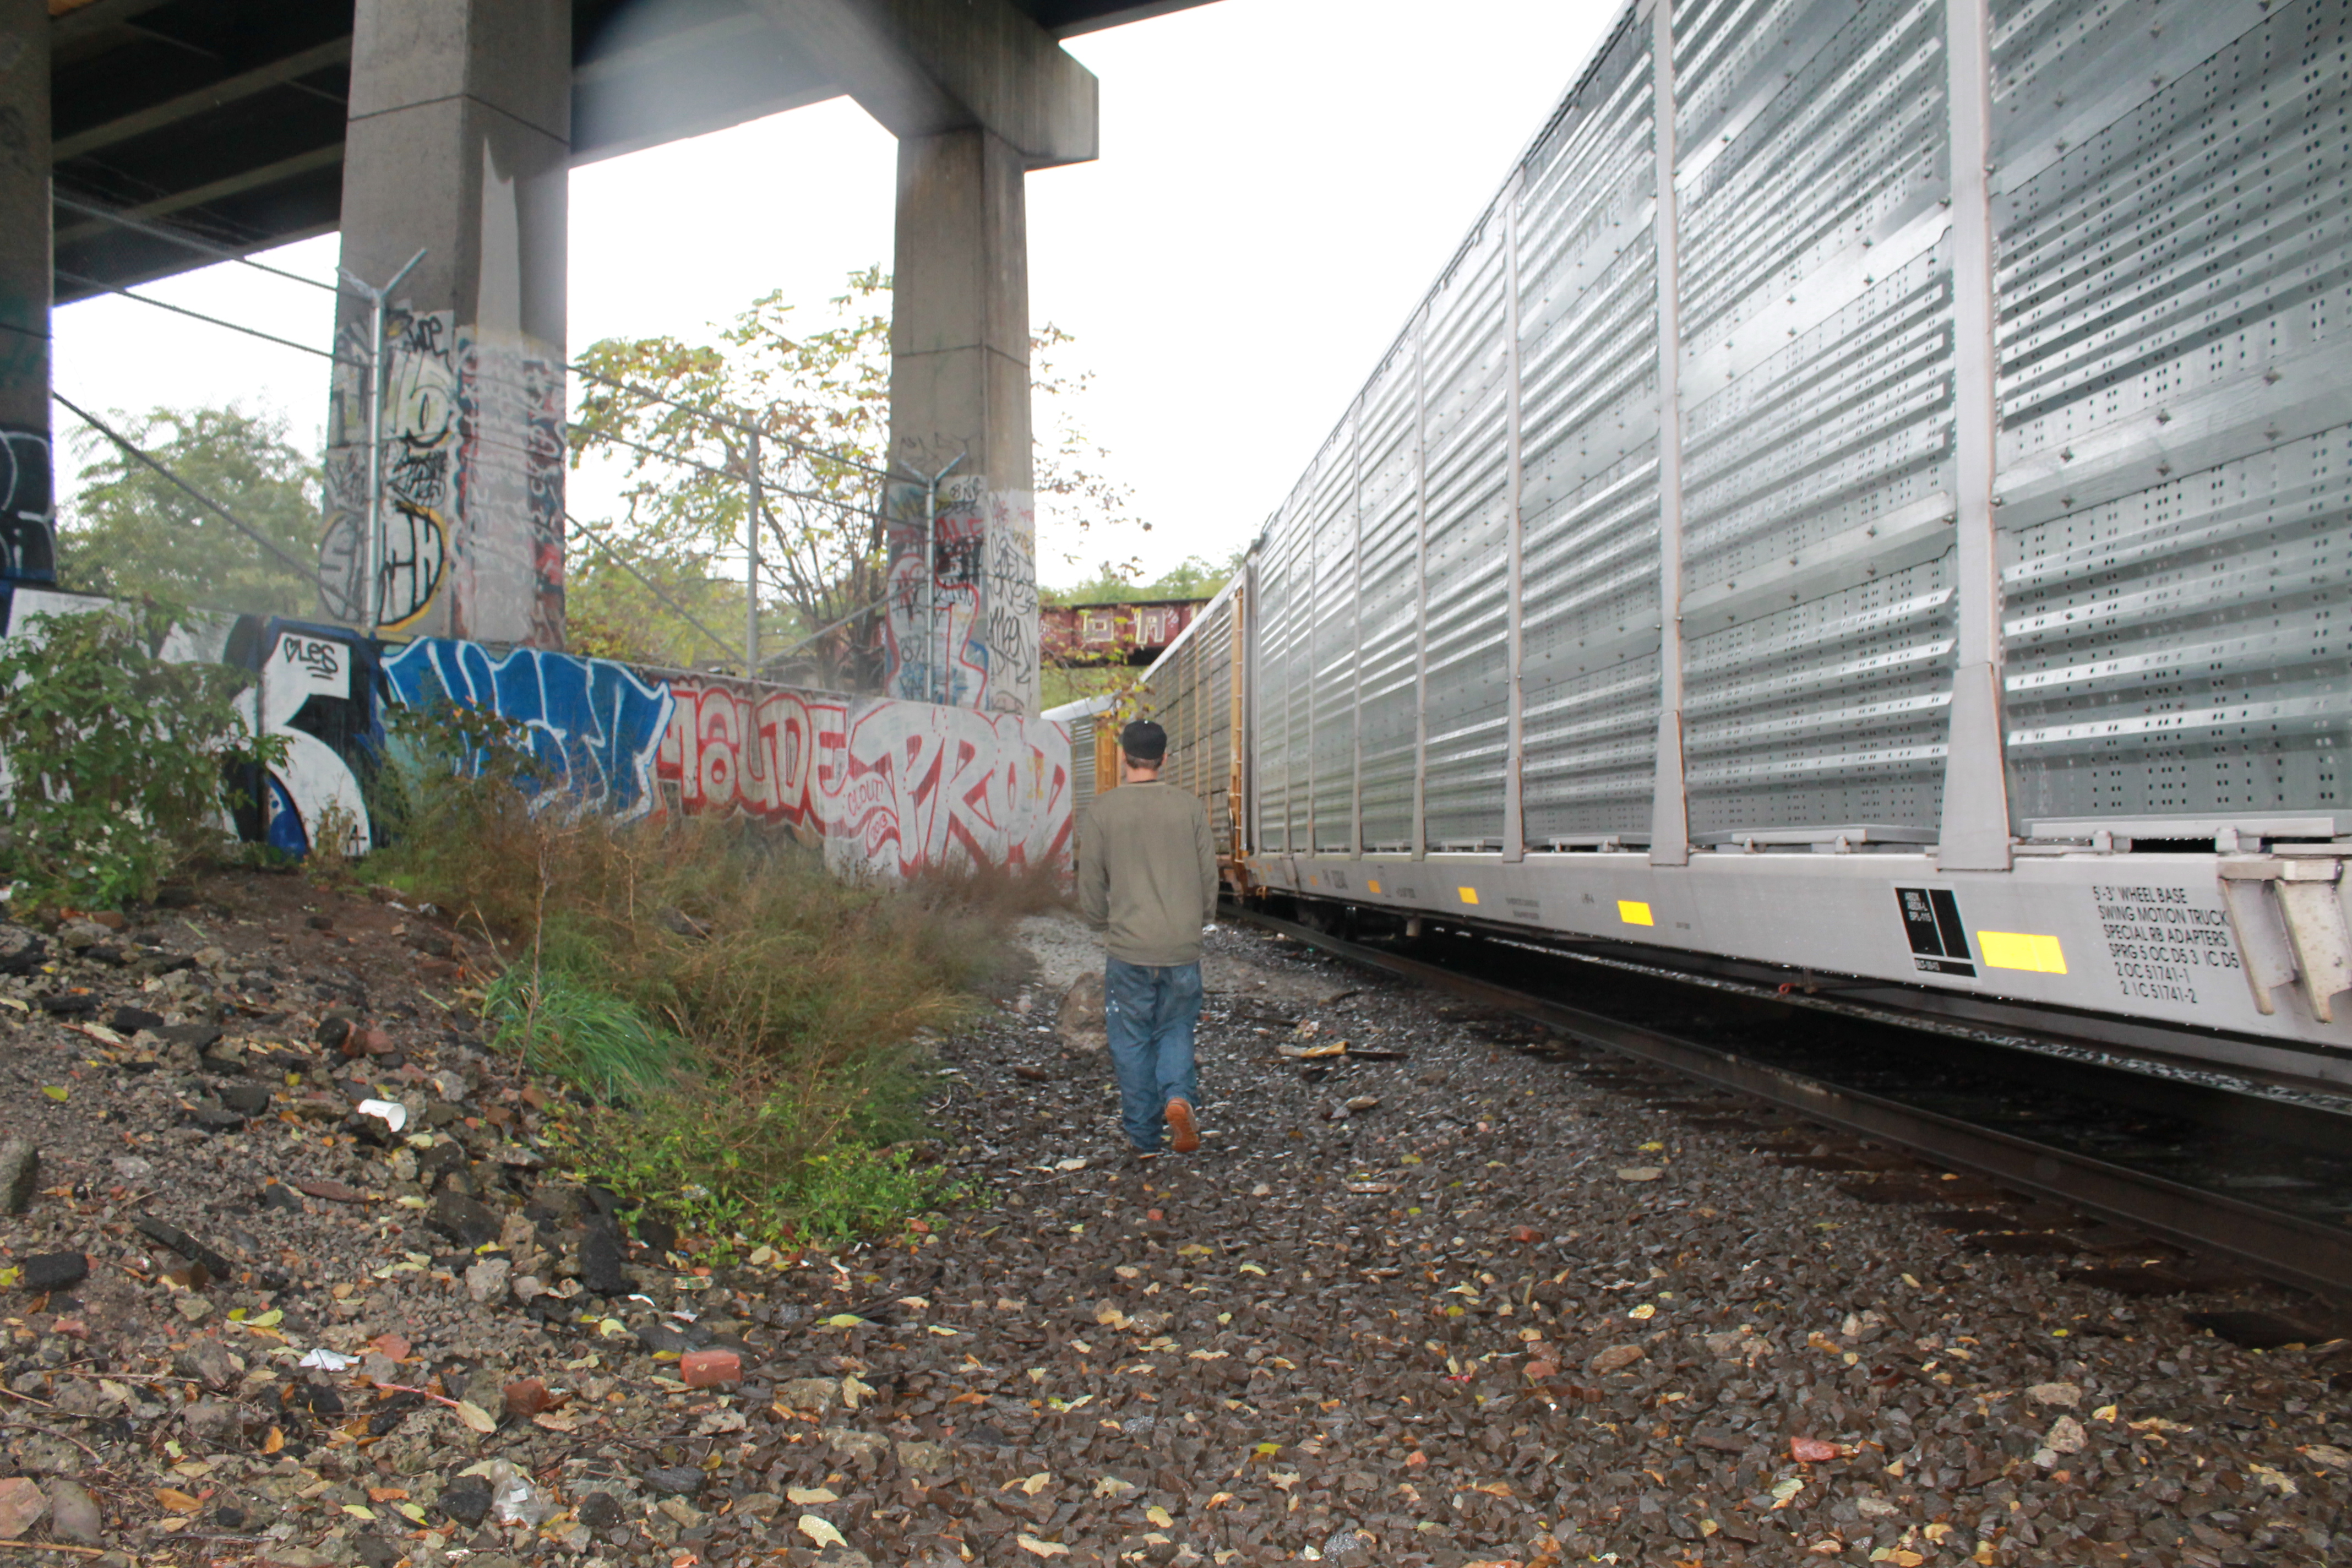 Graffiti art jersey city - Do You See That Changing No Definitely Not It S Strange Because Jersey City Is Embracing Graffiti Like Mana Arts Is Introducing It